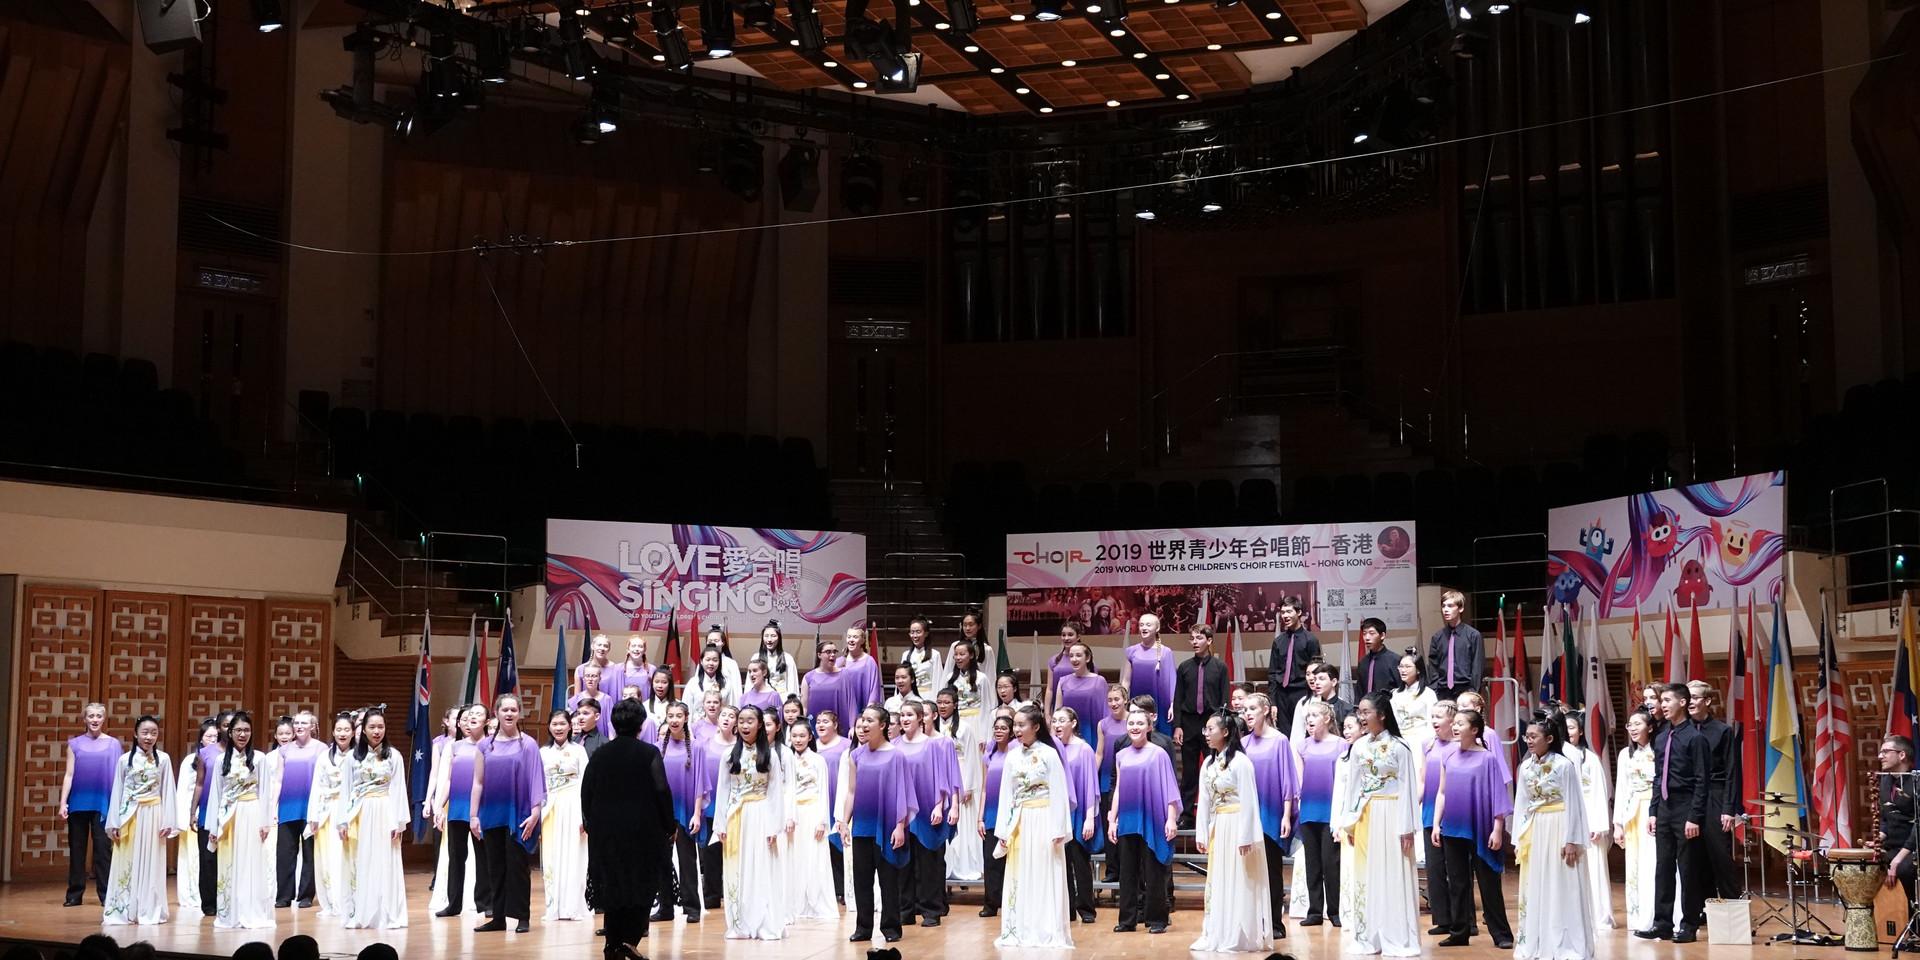 Hamilton Children's Choir and Good Hope